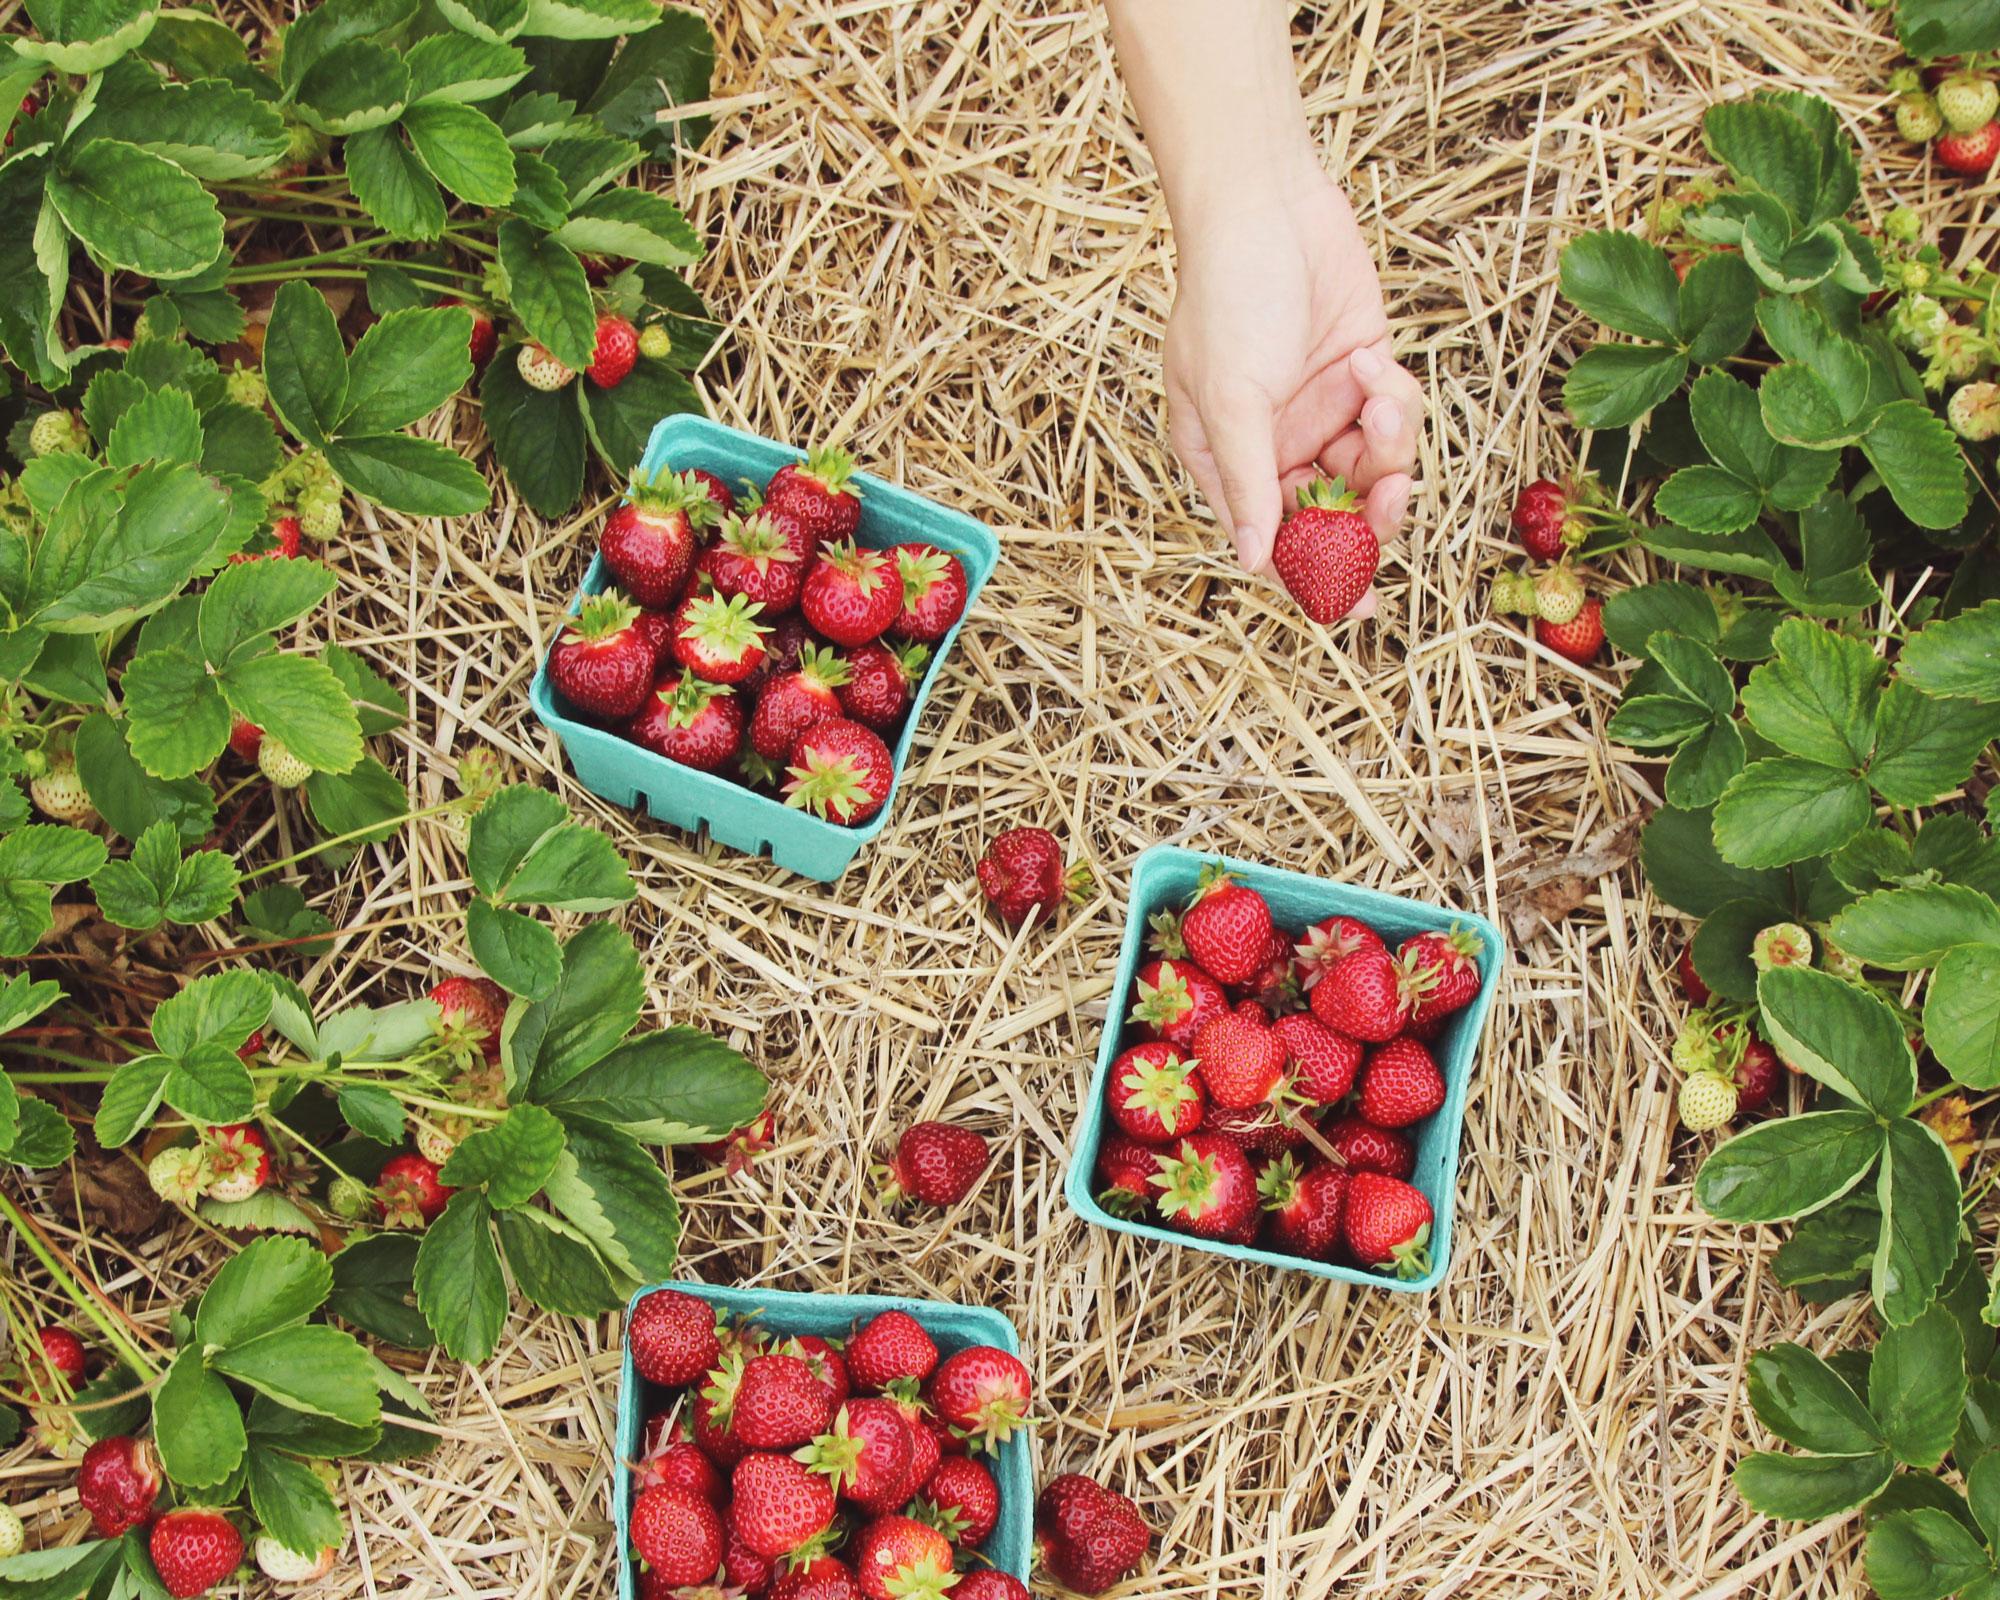 hand-strawberry-picking-unsplash